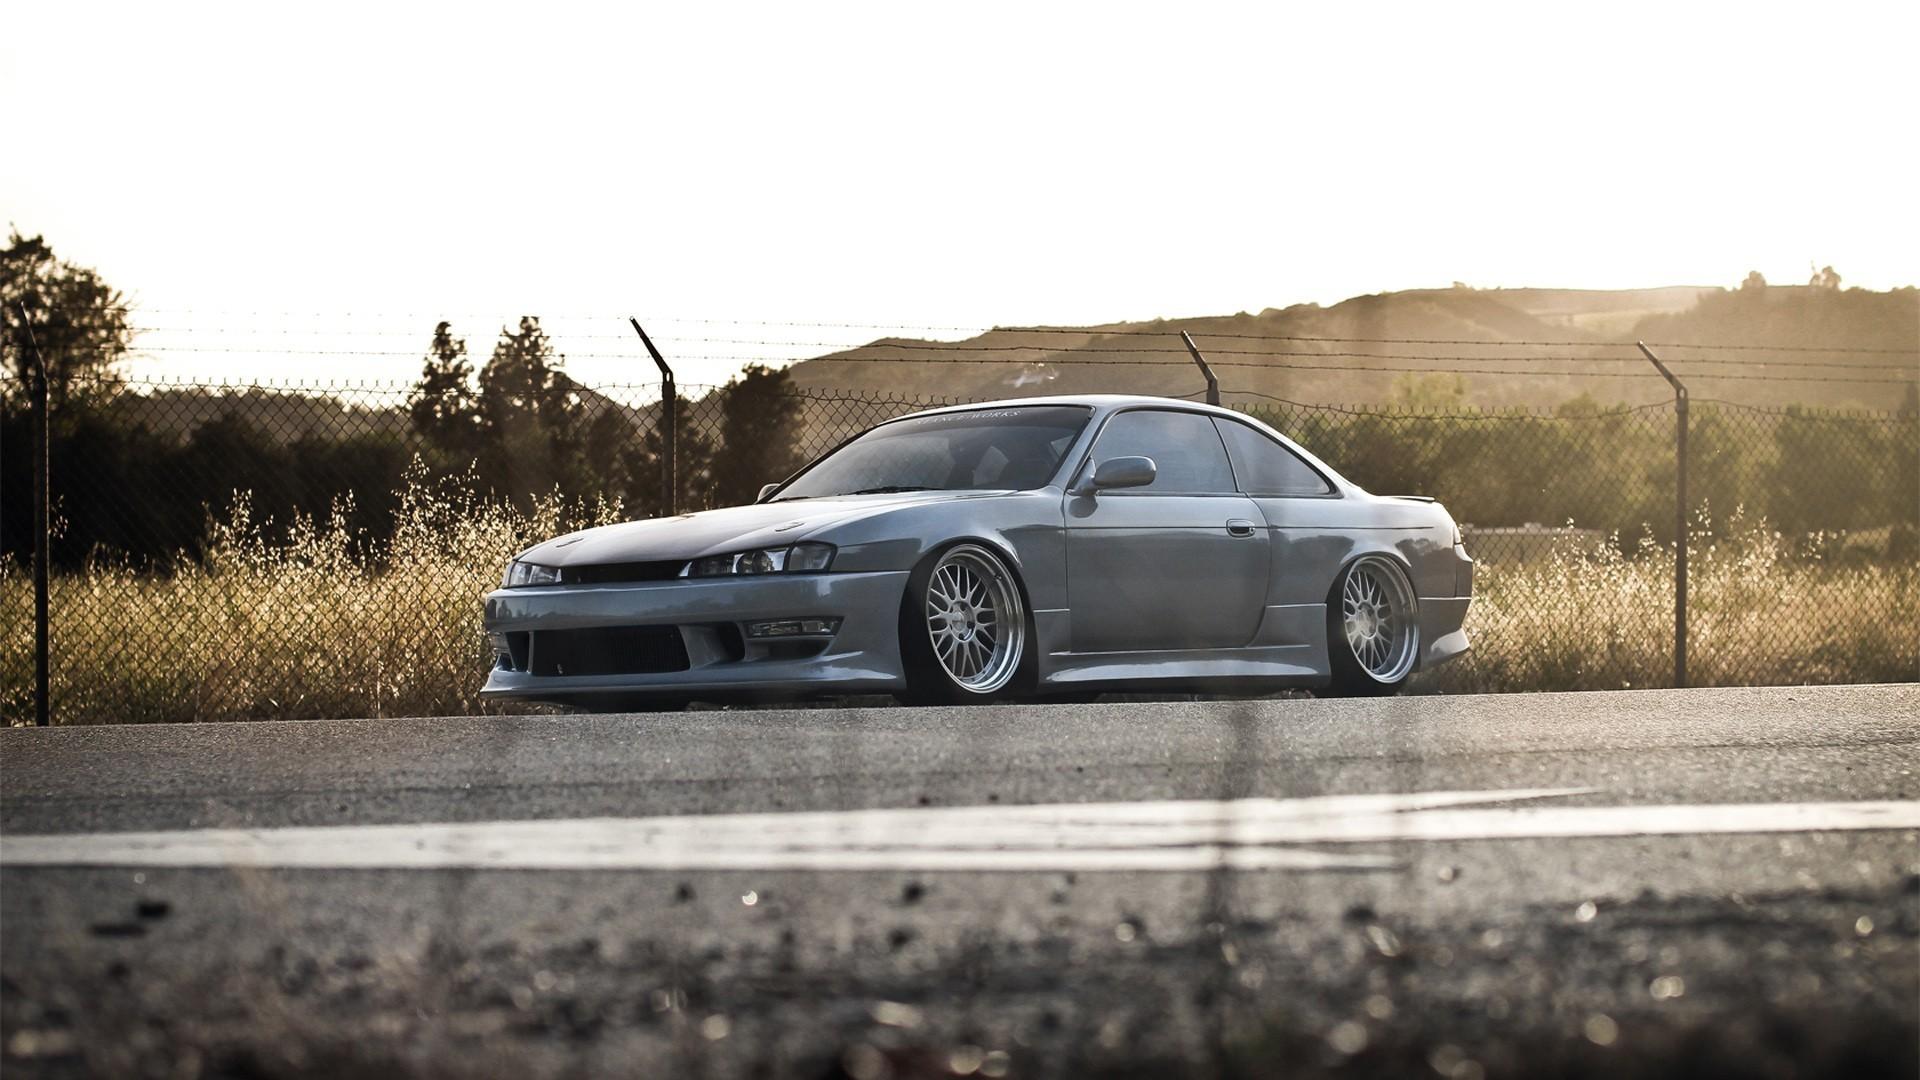 Nissan Silvia S14 Nissan Silvia Nissan Jdm Wallpapers Nissan 200sx 1920x1080 Wallpaper Teahub Io